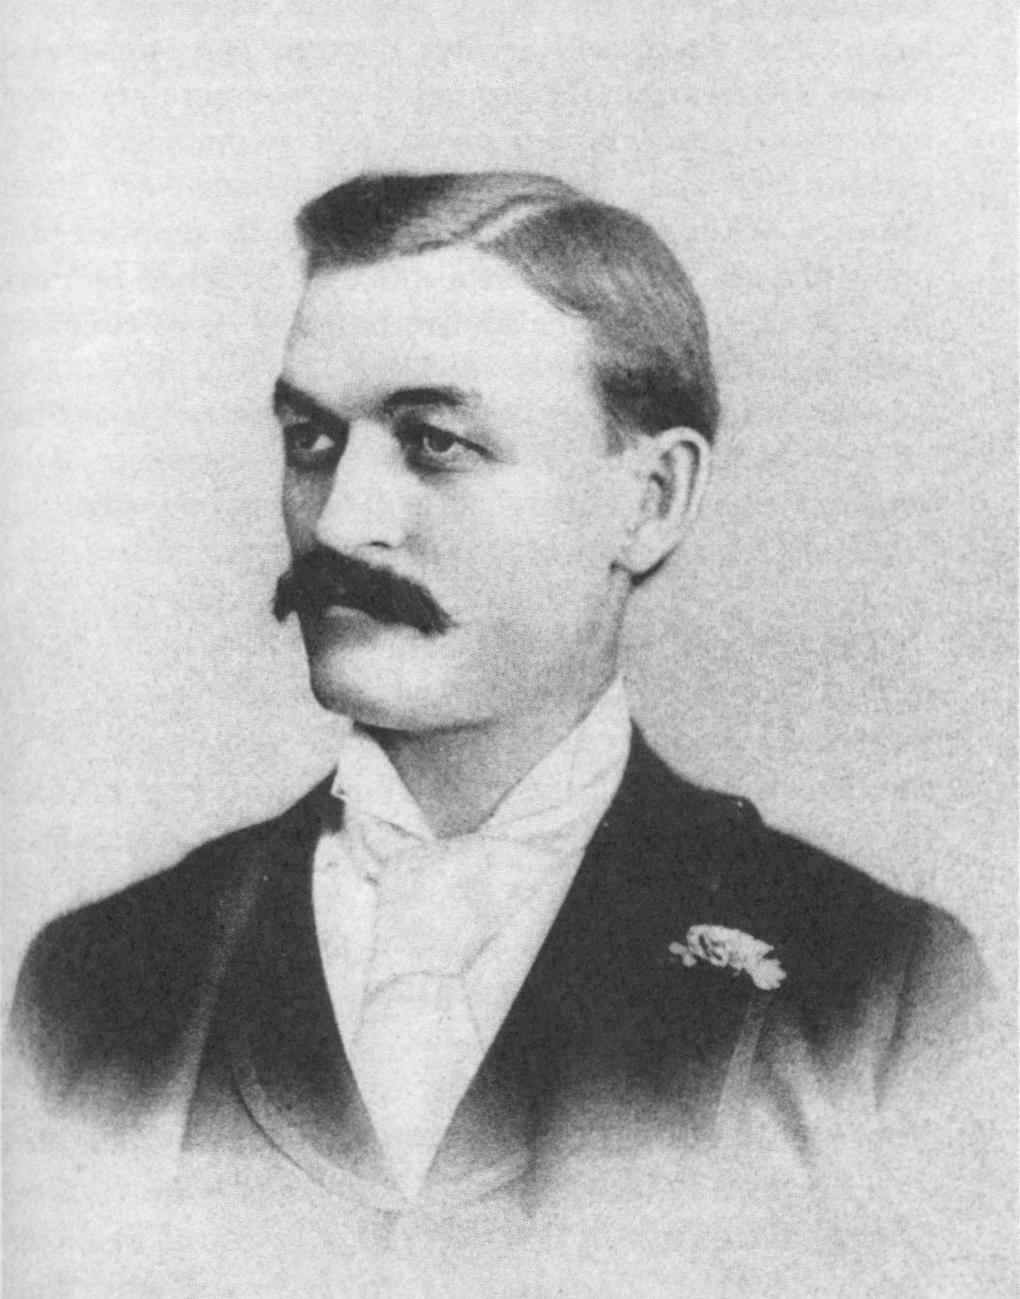 George washington born